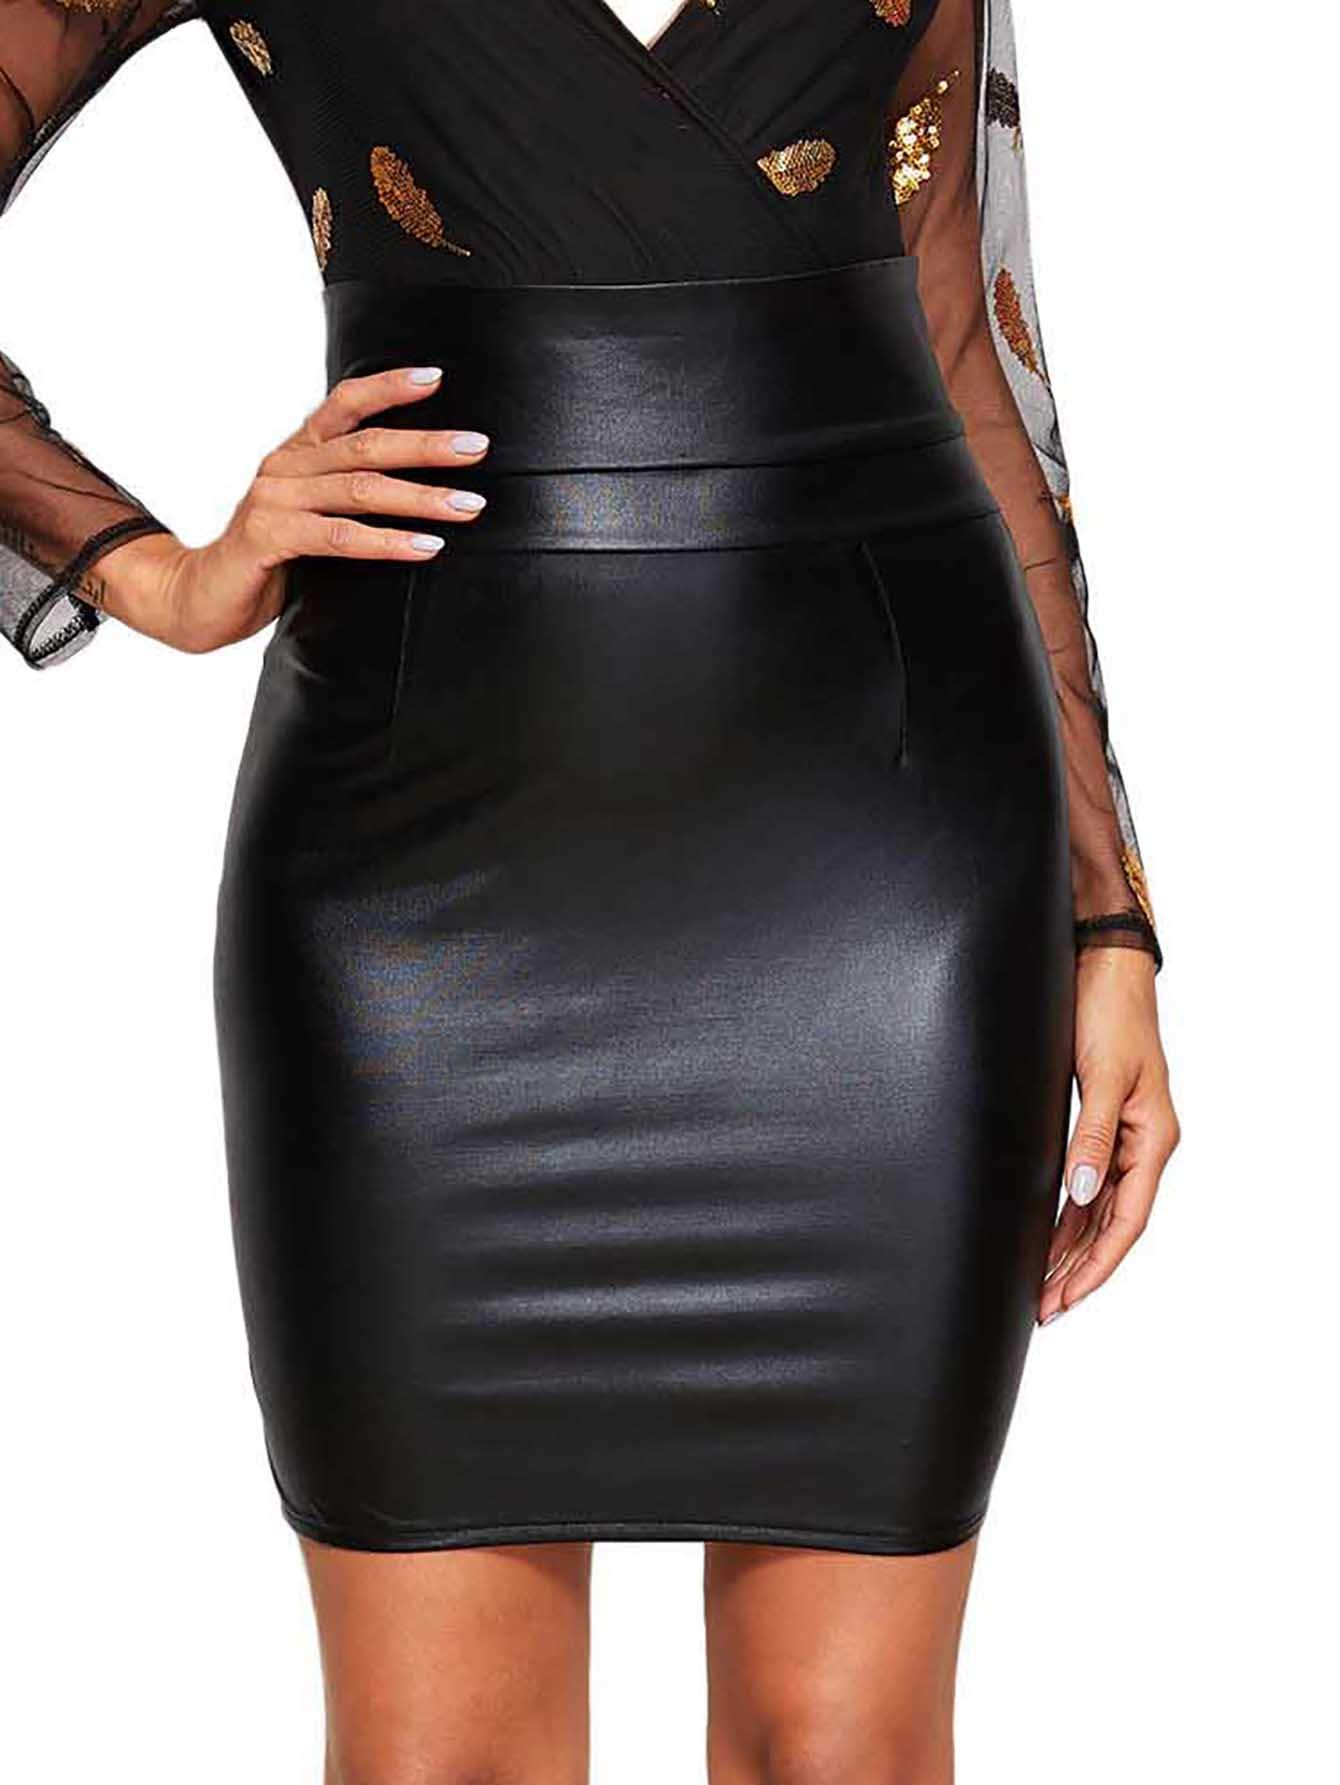 WDIRARA Women's Elegant High Waist Split Side Solid Faux Leather Bodycon Skirt